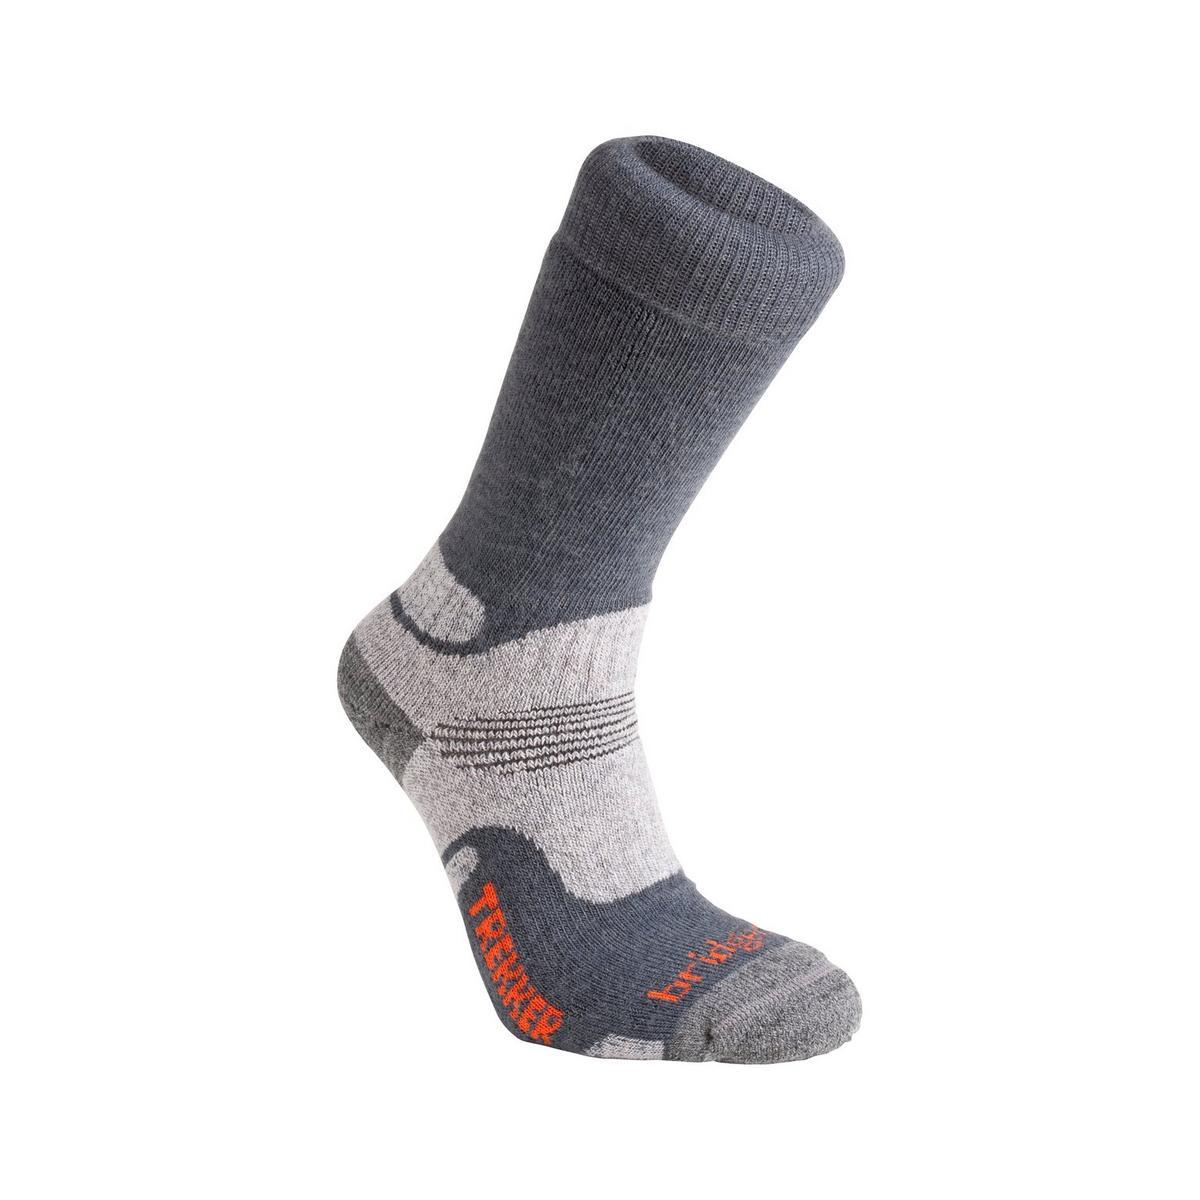 Bridgedale Men's Merino Performance Hike Midweight Socks